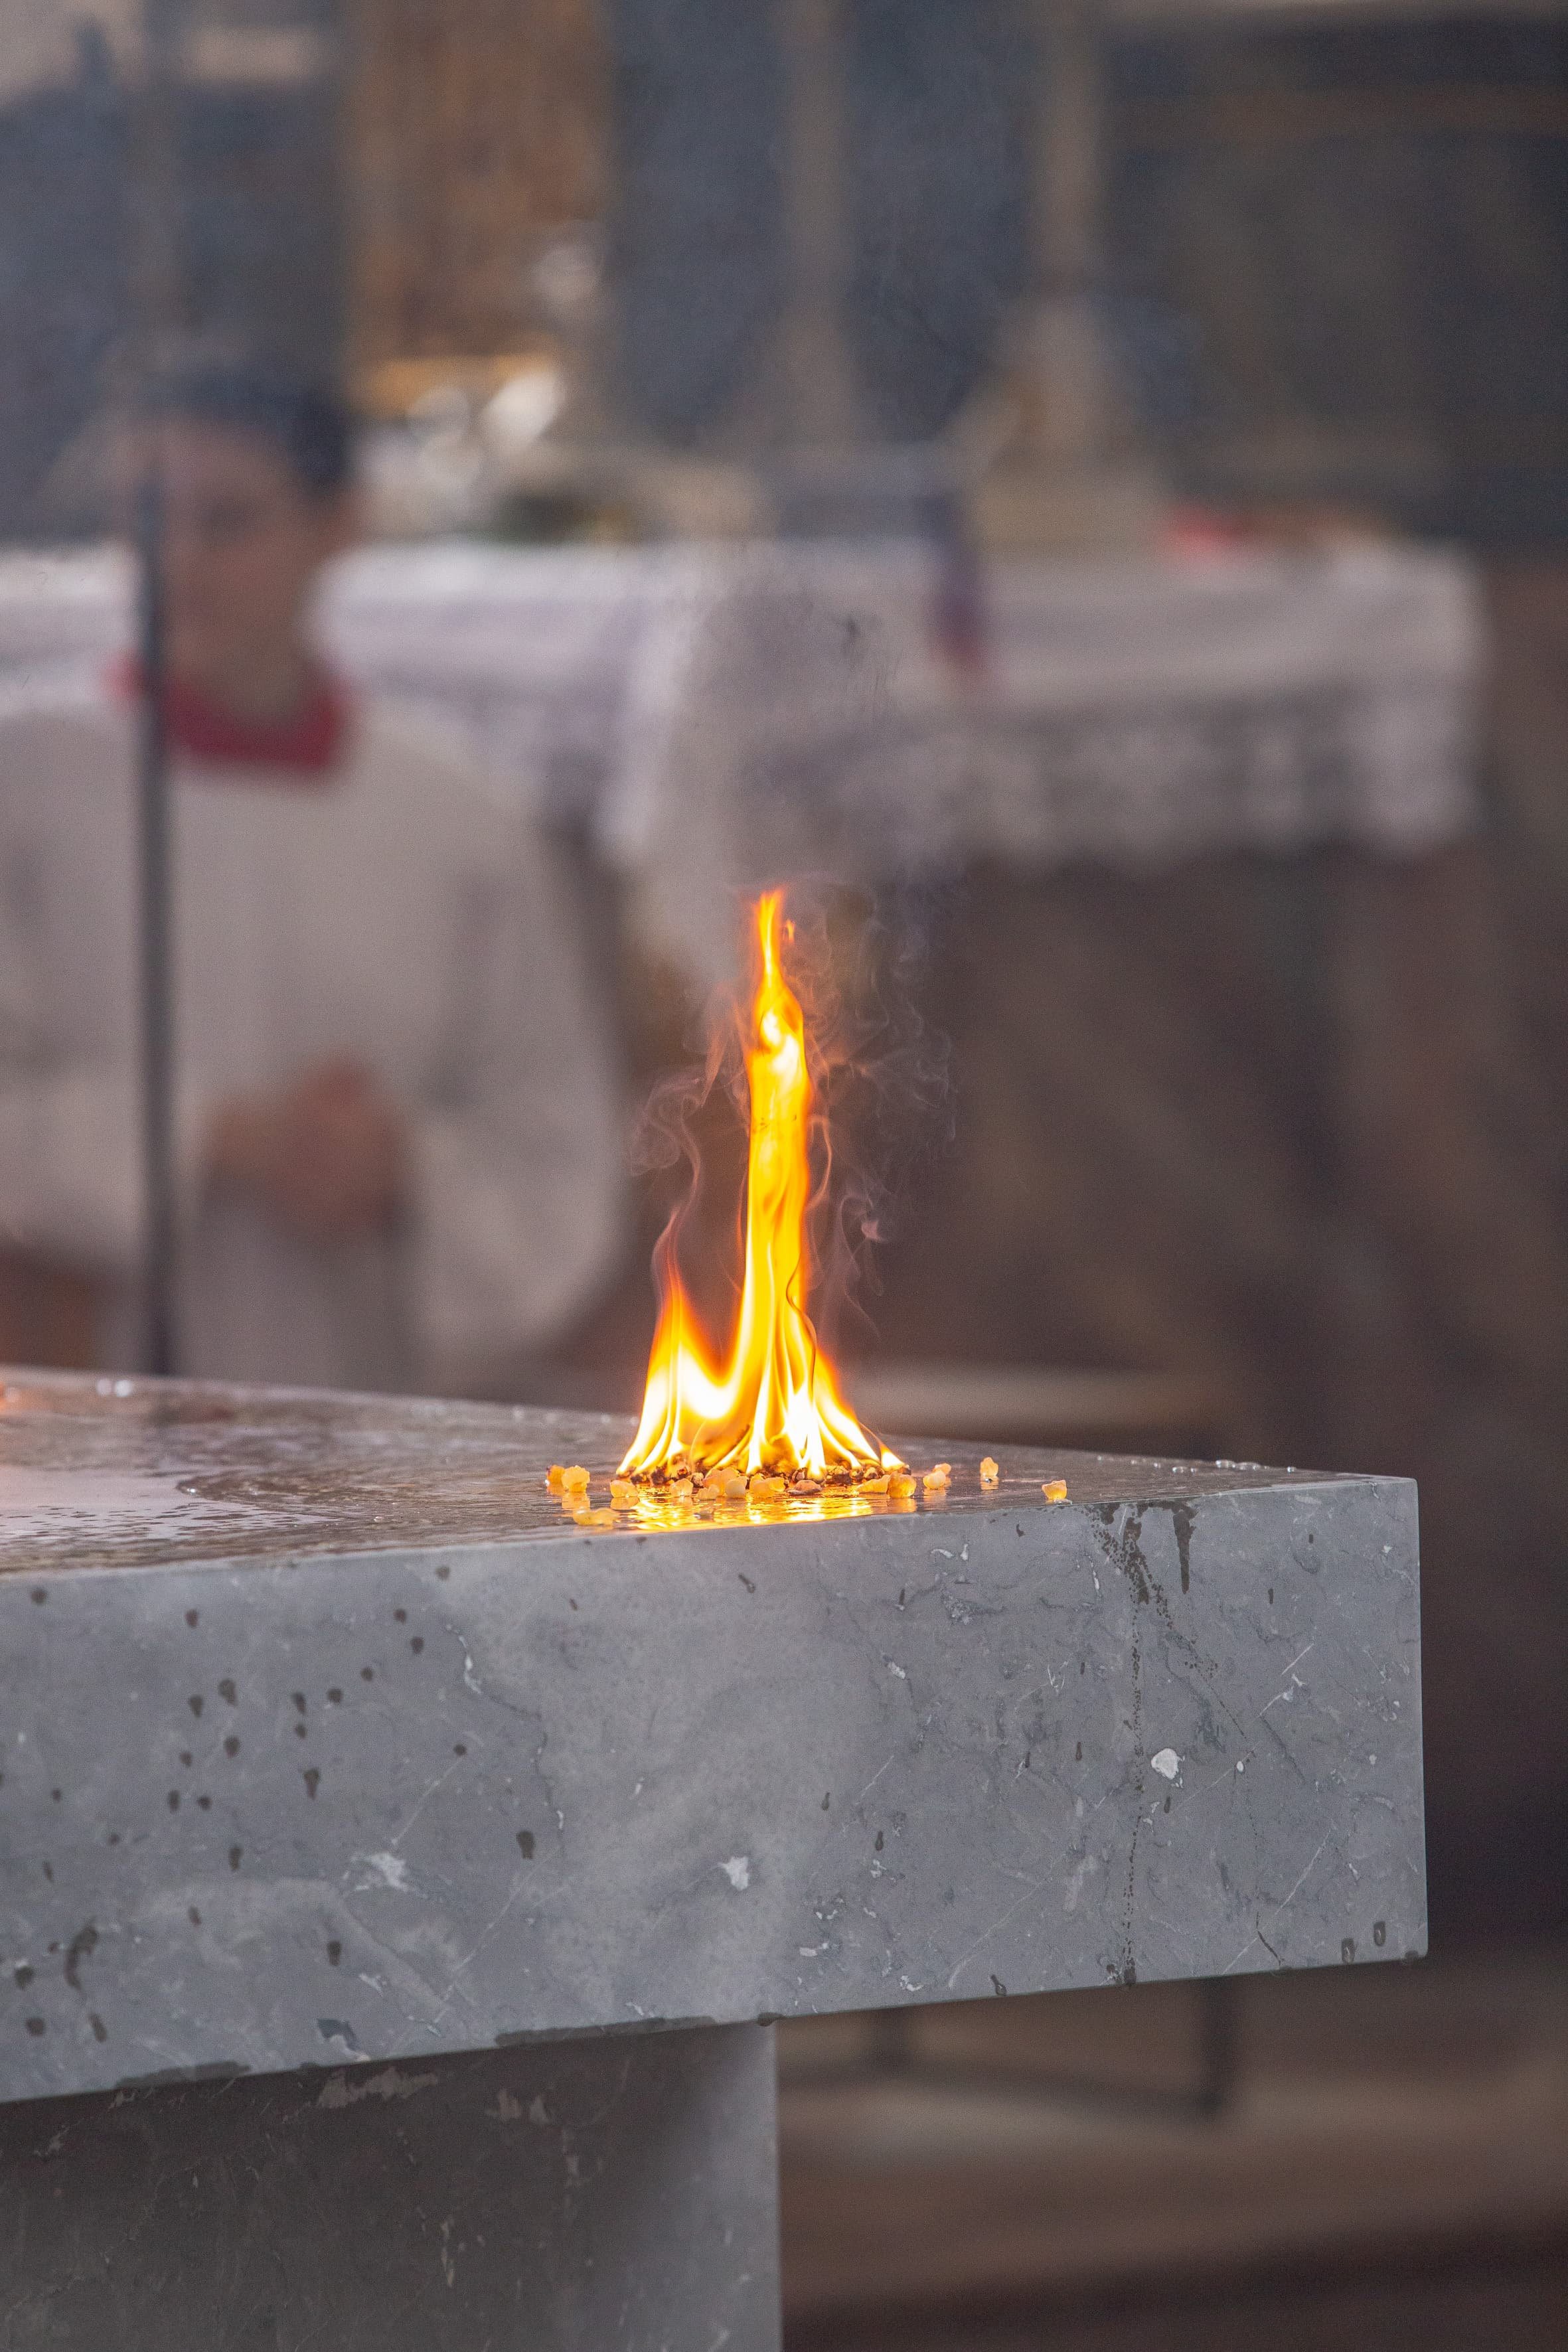 Pfarrkirche Mariä Himmelfahrt Bad Aibling Altar Feuer